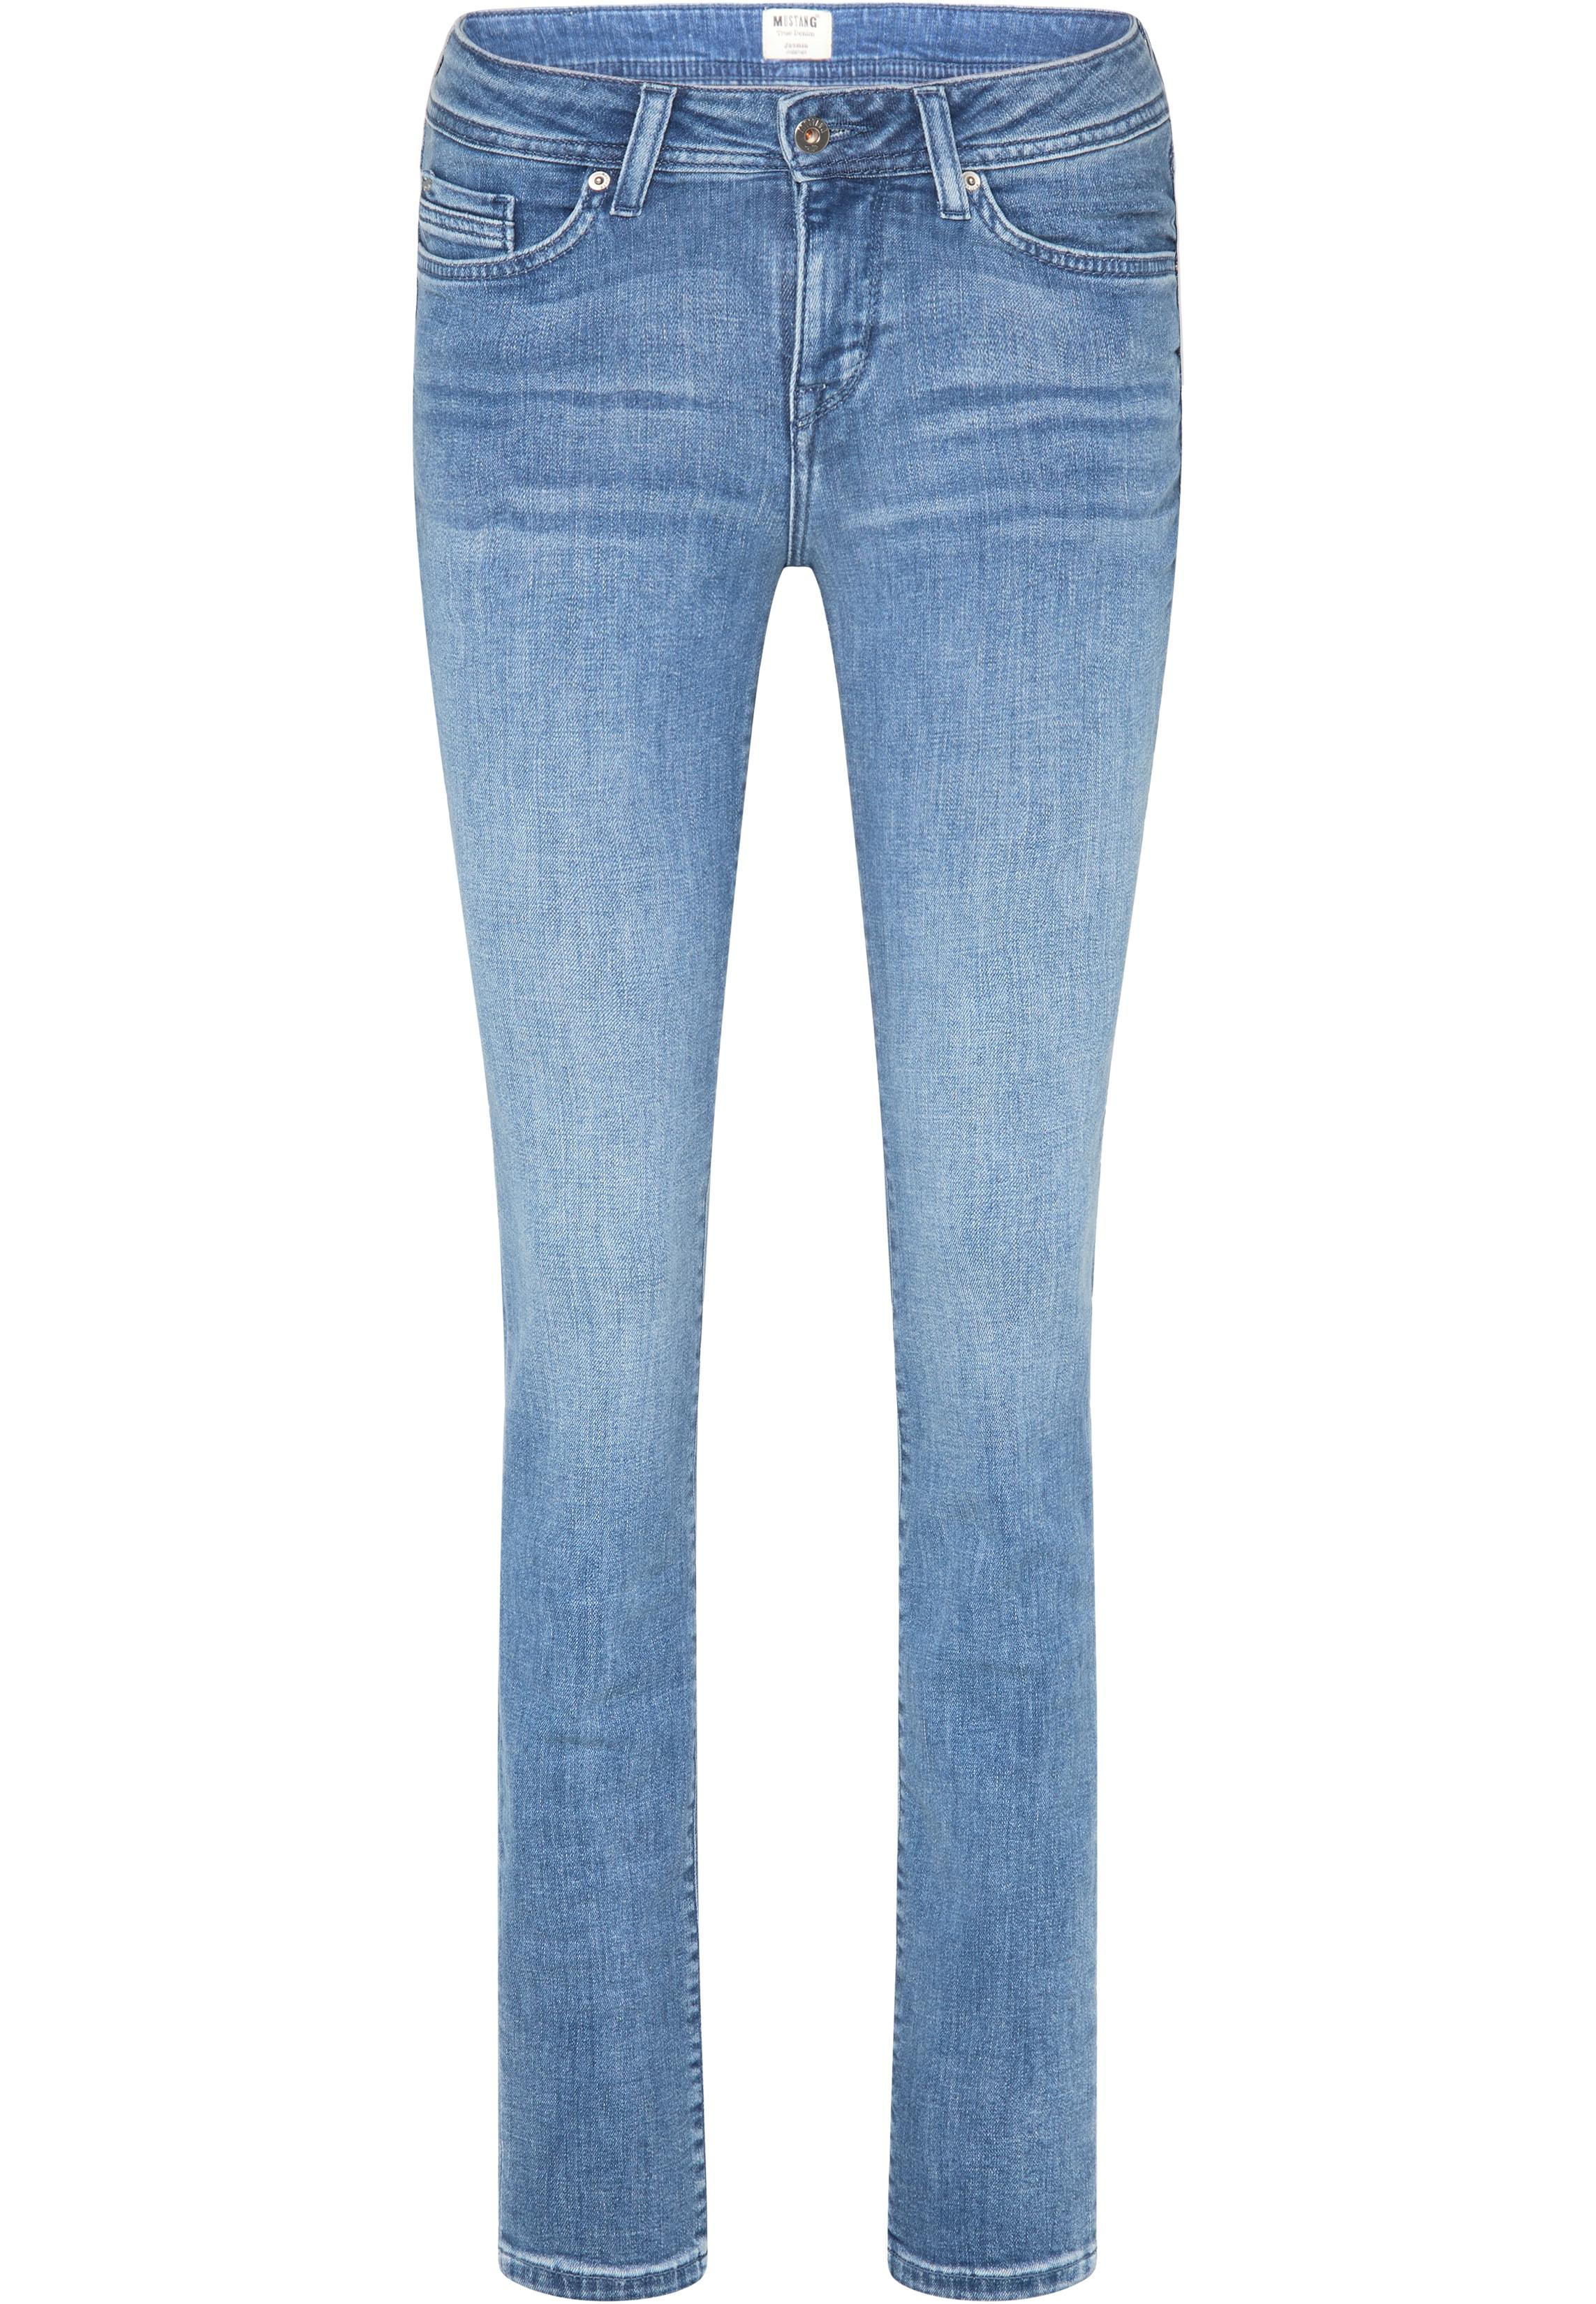 mustang -  Jeansleggings Jasmin Jeggings, Jeans Hose